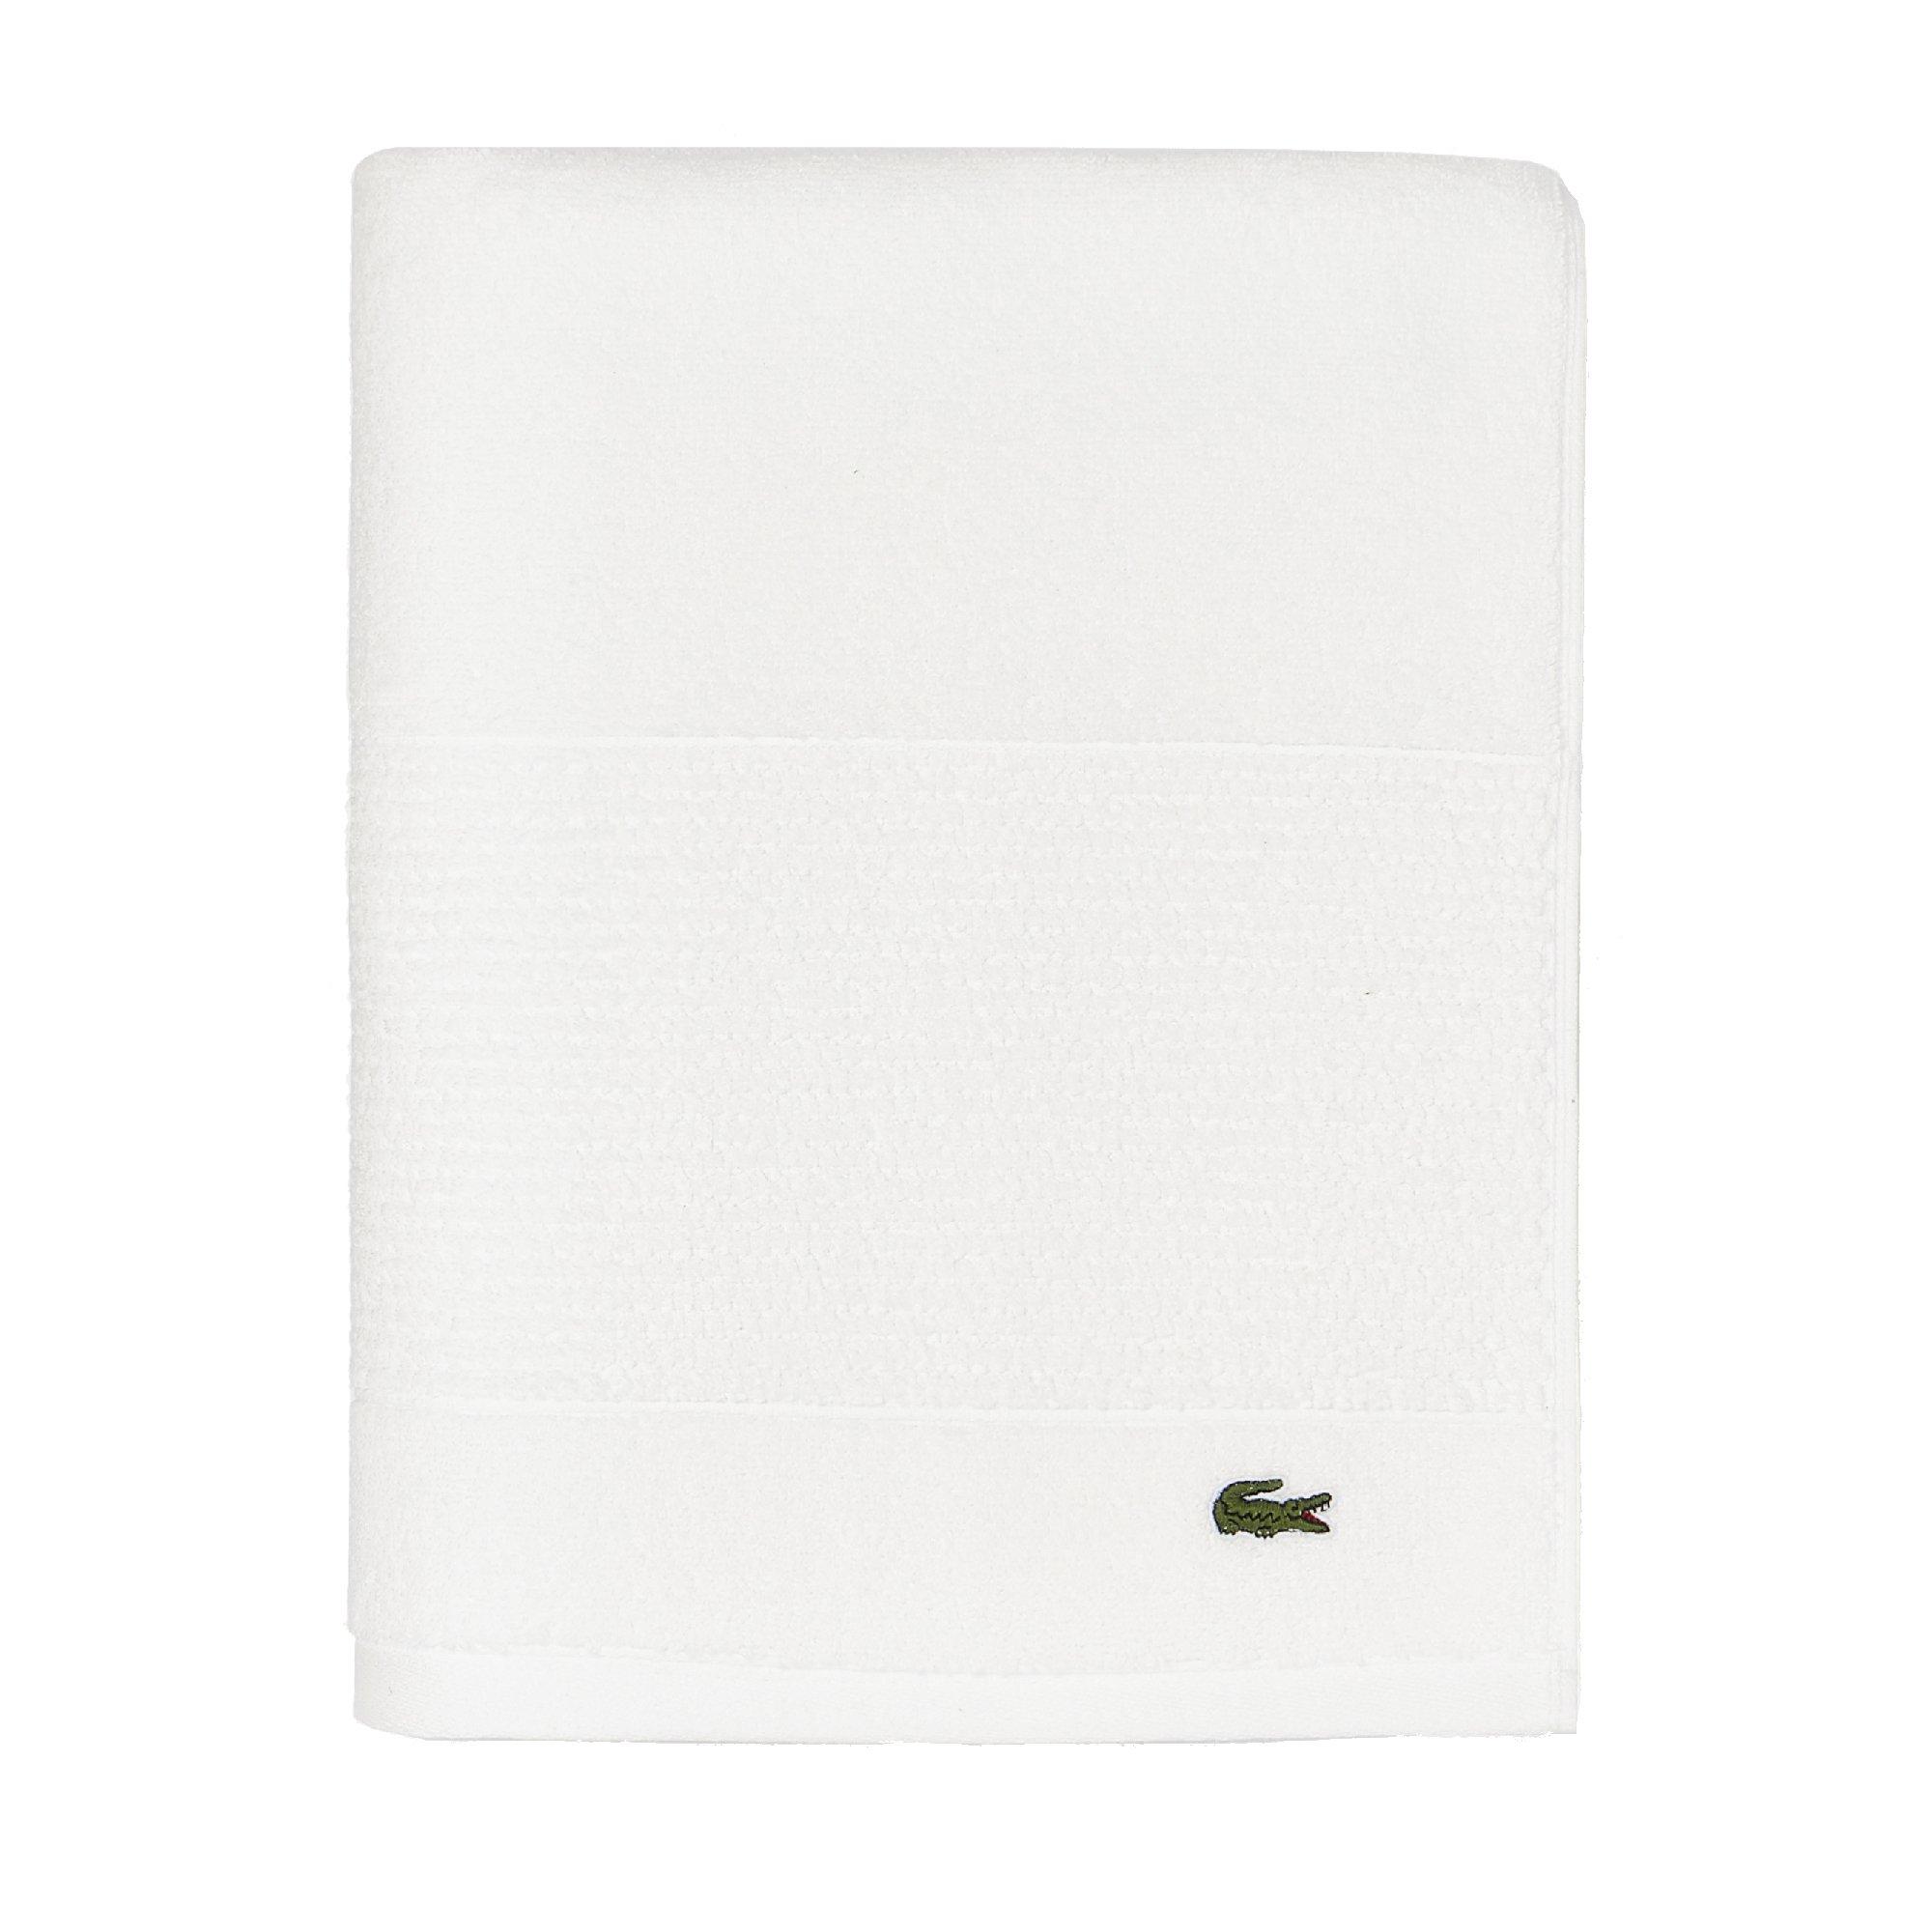 Lacoste Legend Towel, 100% Supima Cotton Loops, 650 GSM, 30''x54'' Bath, White